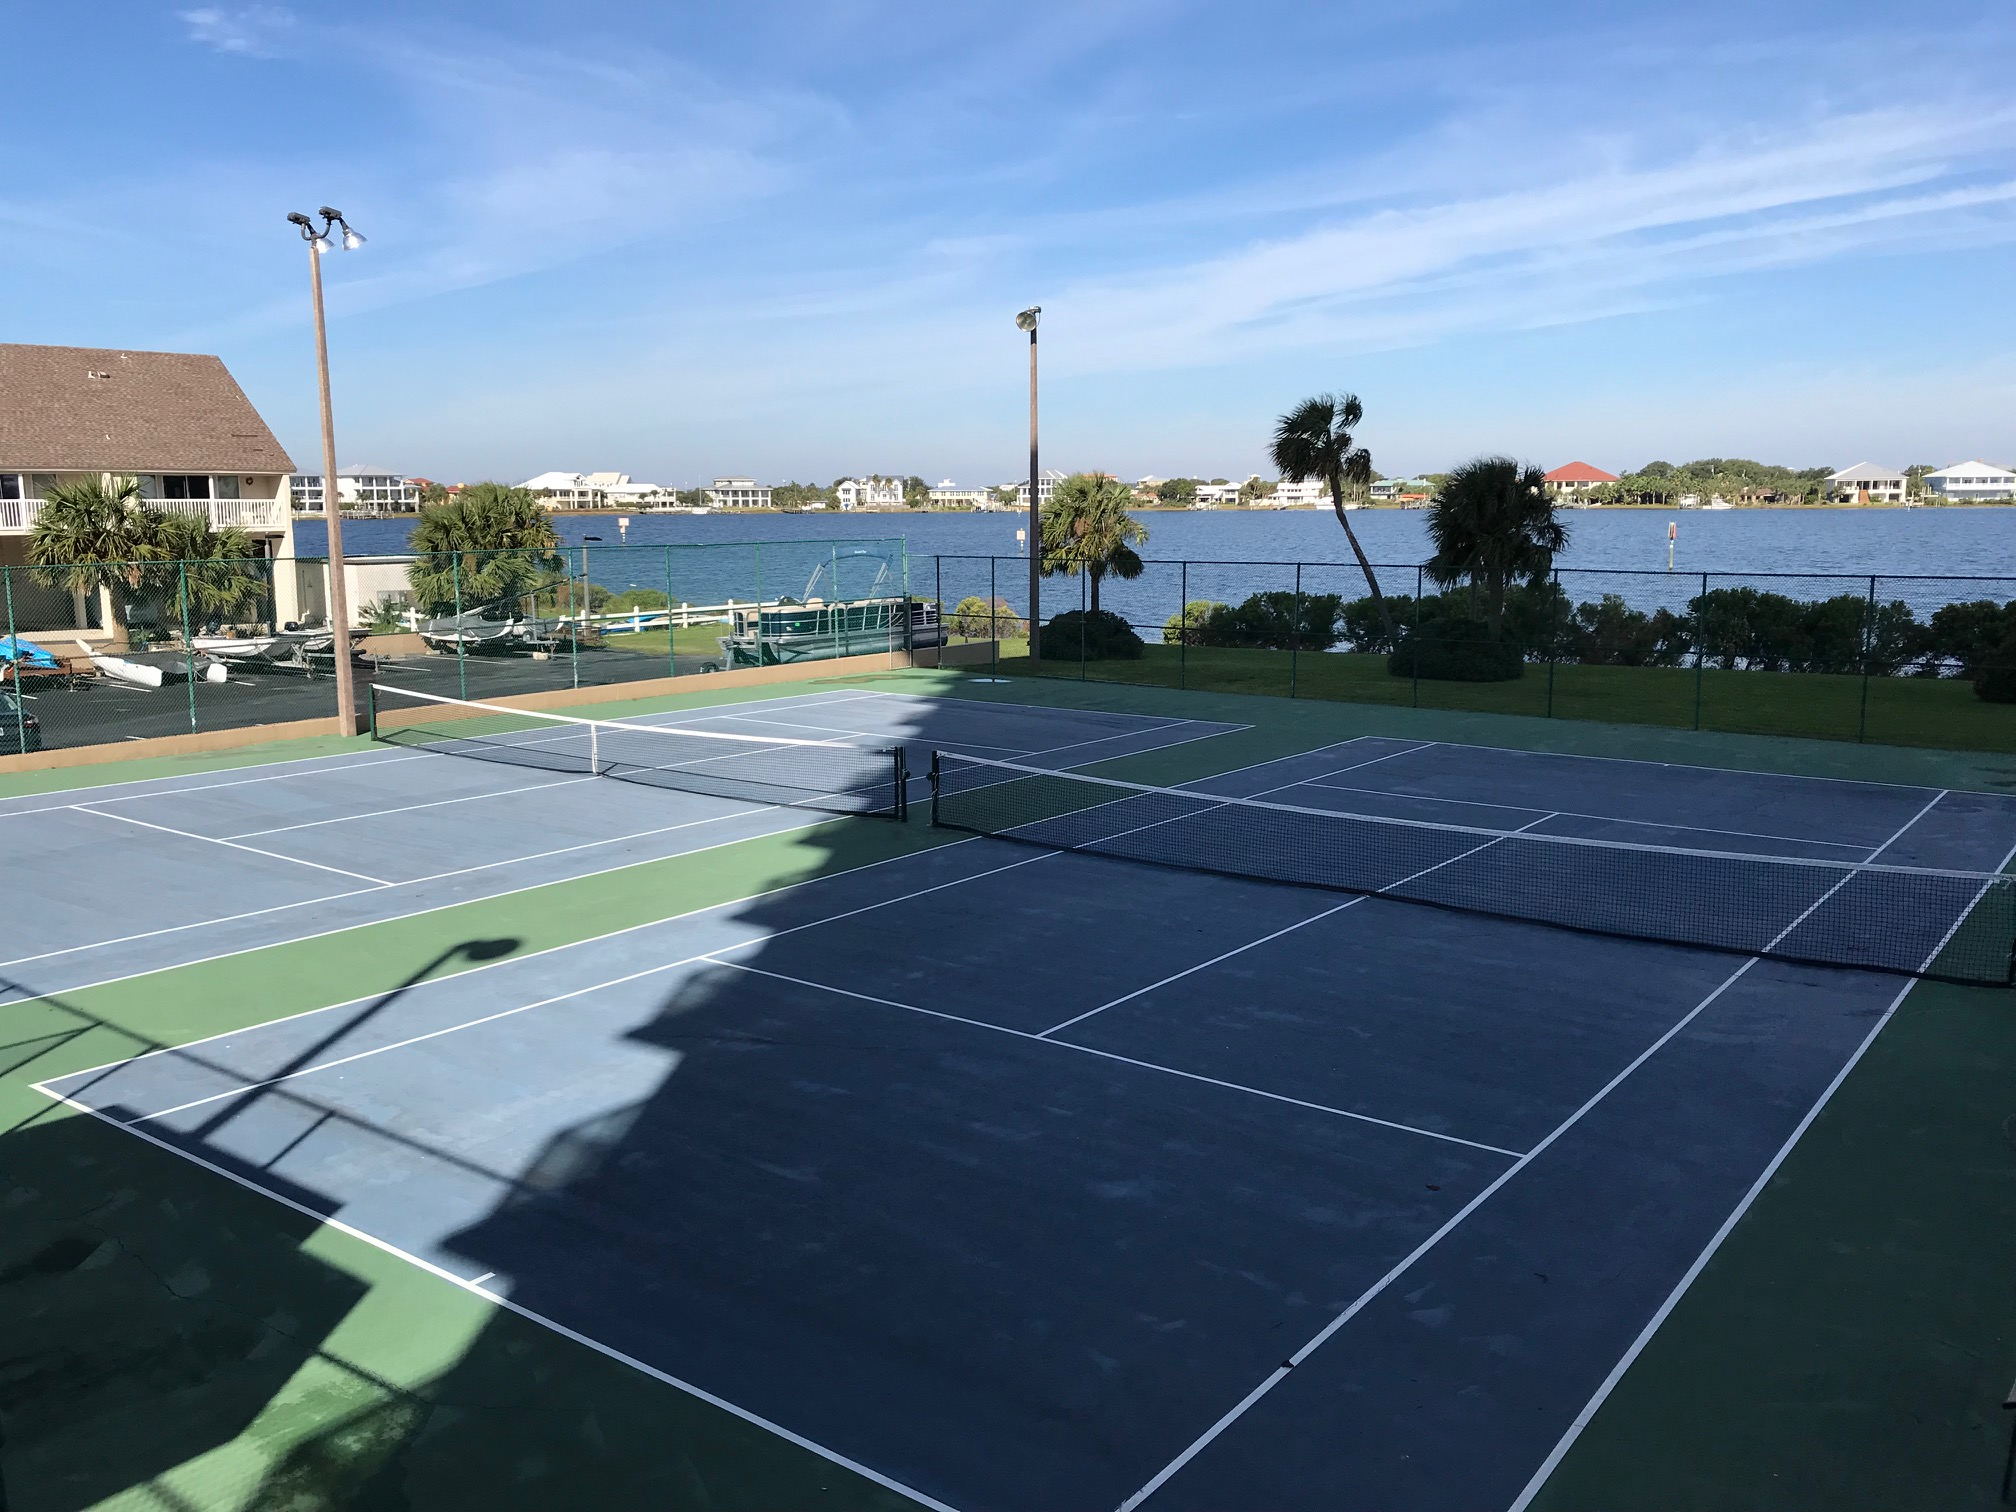 Sabine Yacht & Racquet Club #9D Condo rental in Sabine Yacht & Racquet Club ~ Pensacola Beach Condo Rentals by BeachGuide in Pensacola Beach Florida - #22